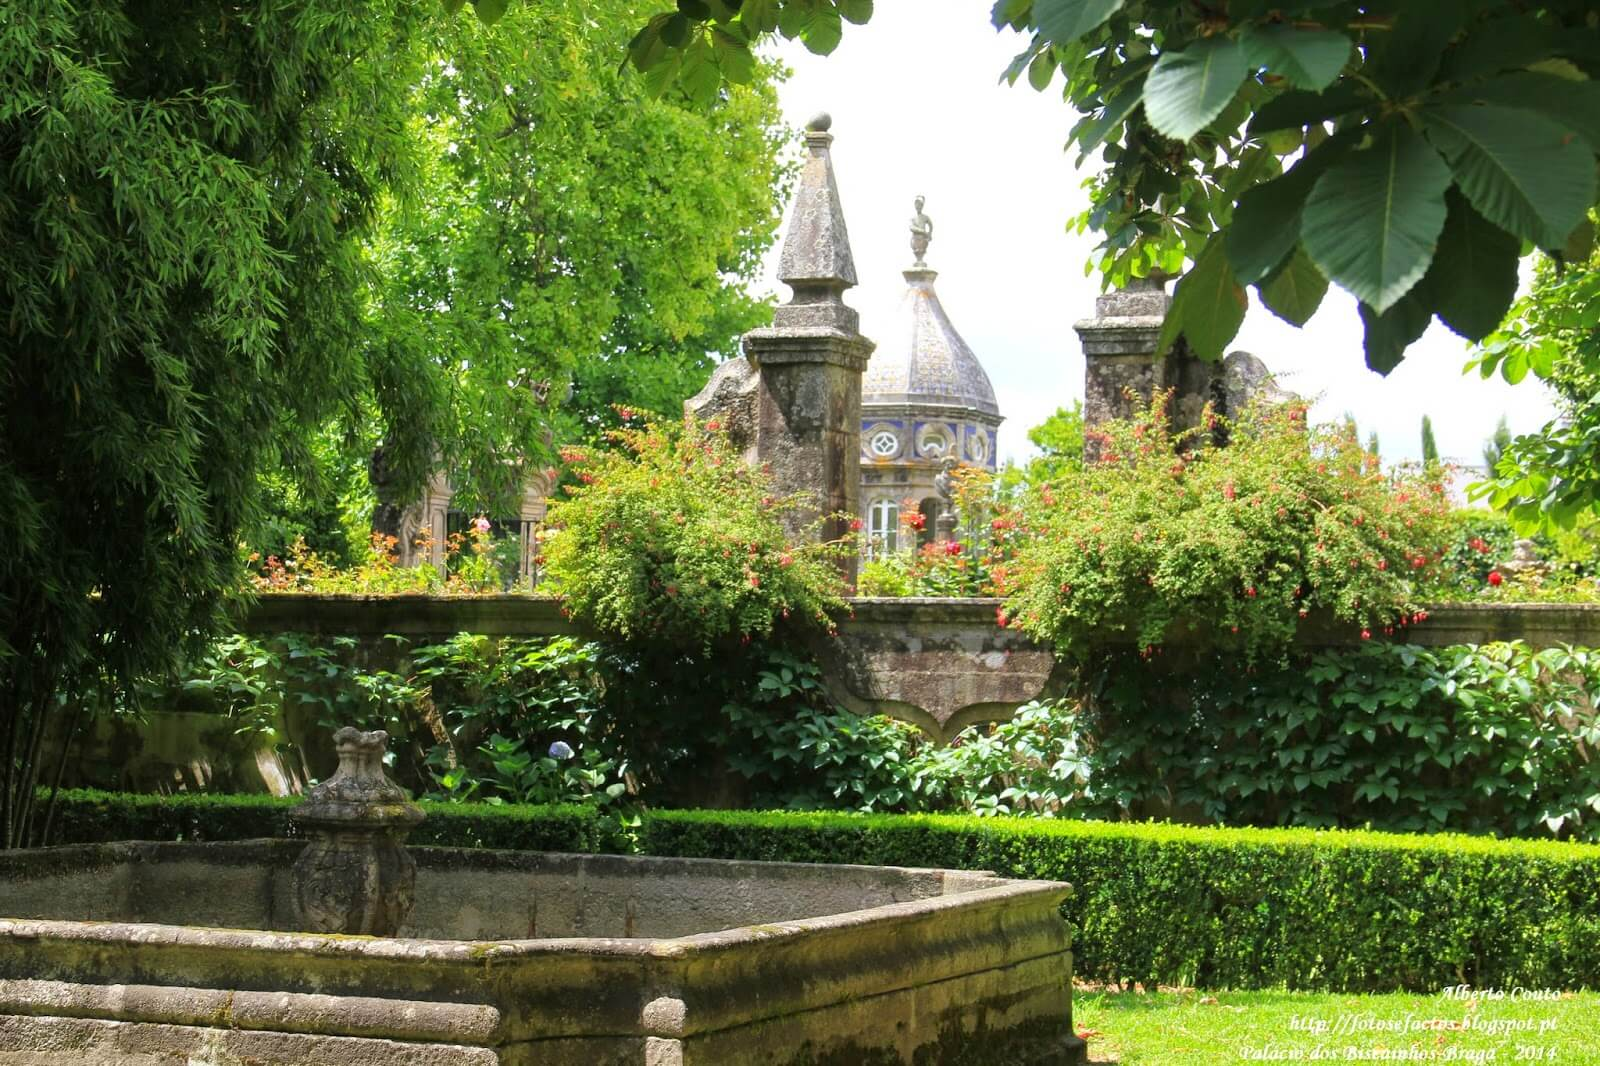 Фото: Дворец и сад Бискаиньюш